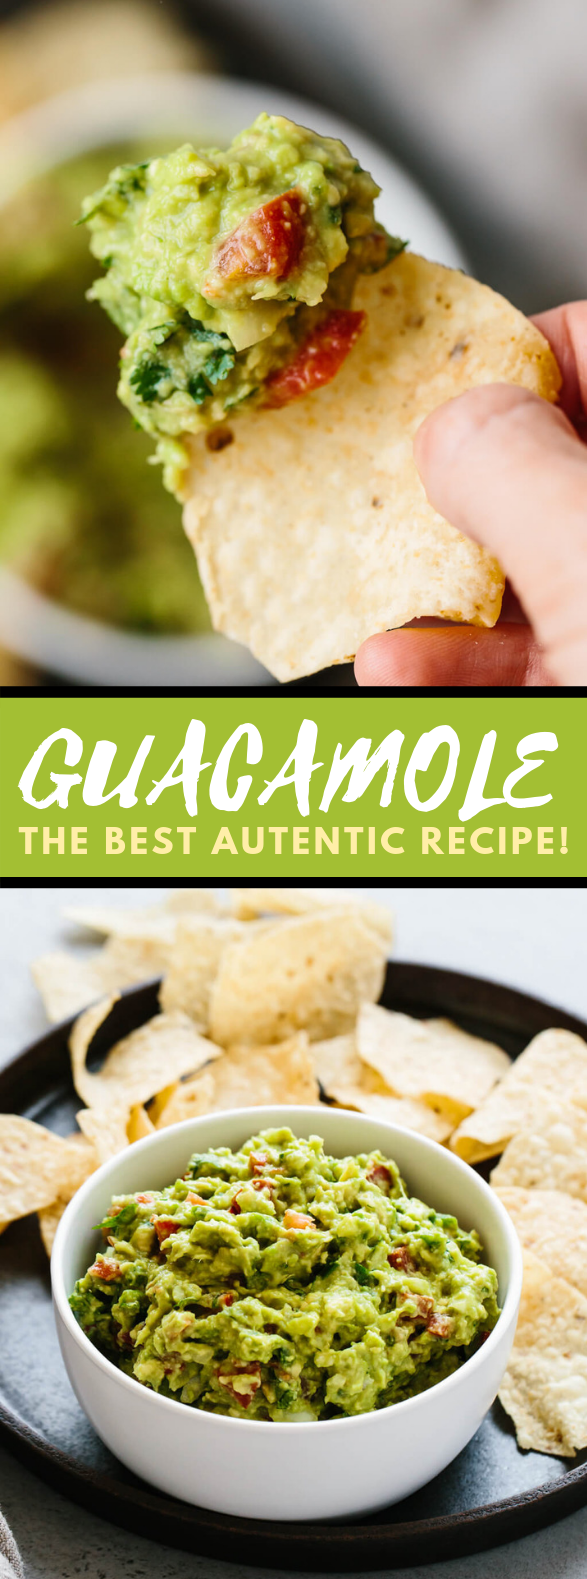 BEST EVER GUACAMOLE #vegetarian #paleo